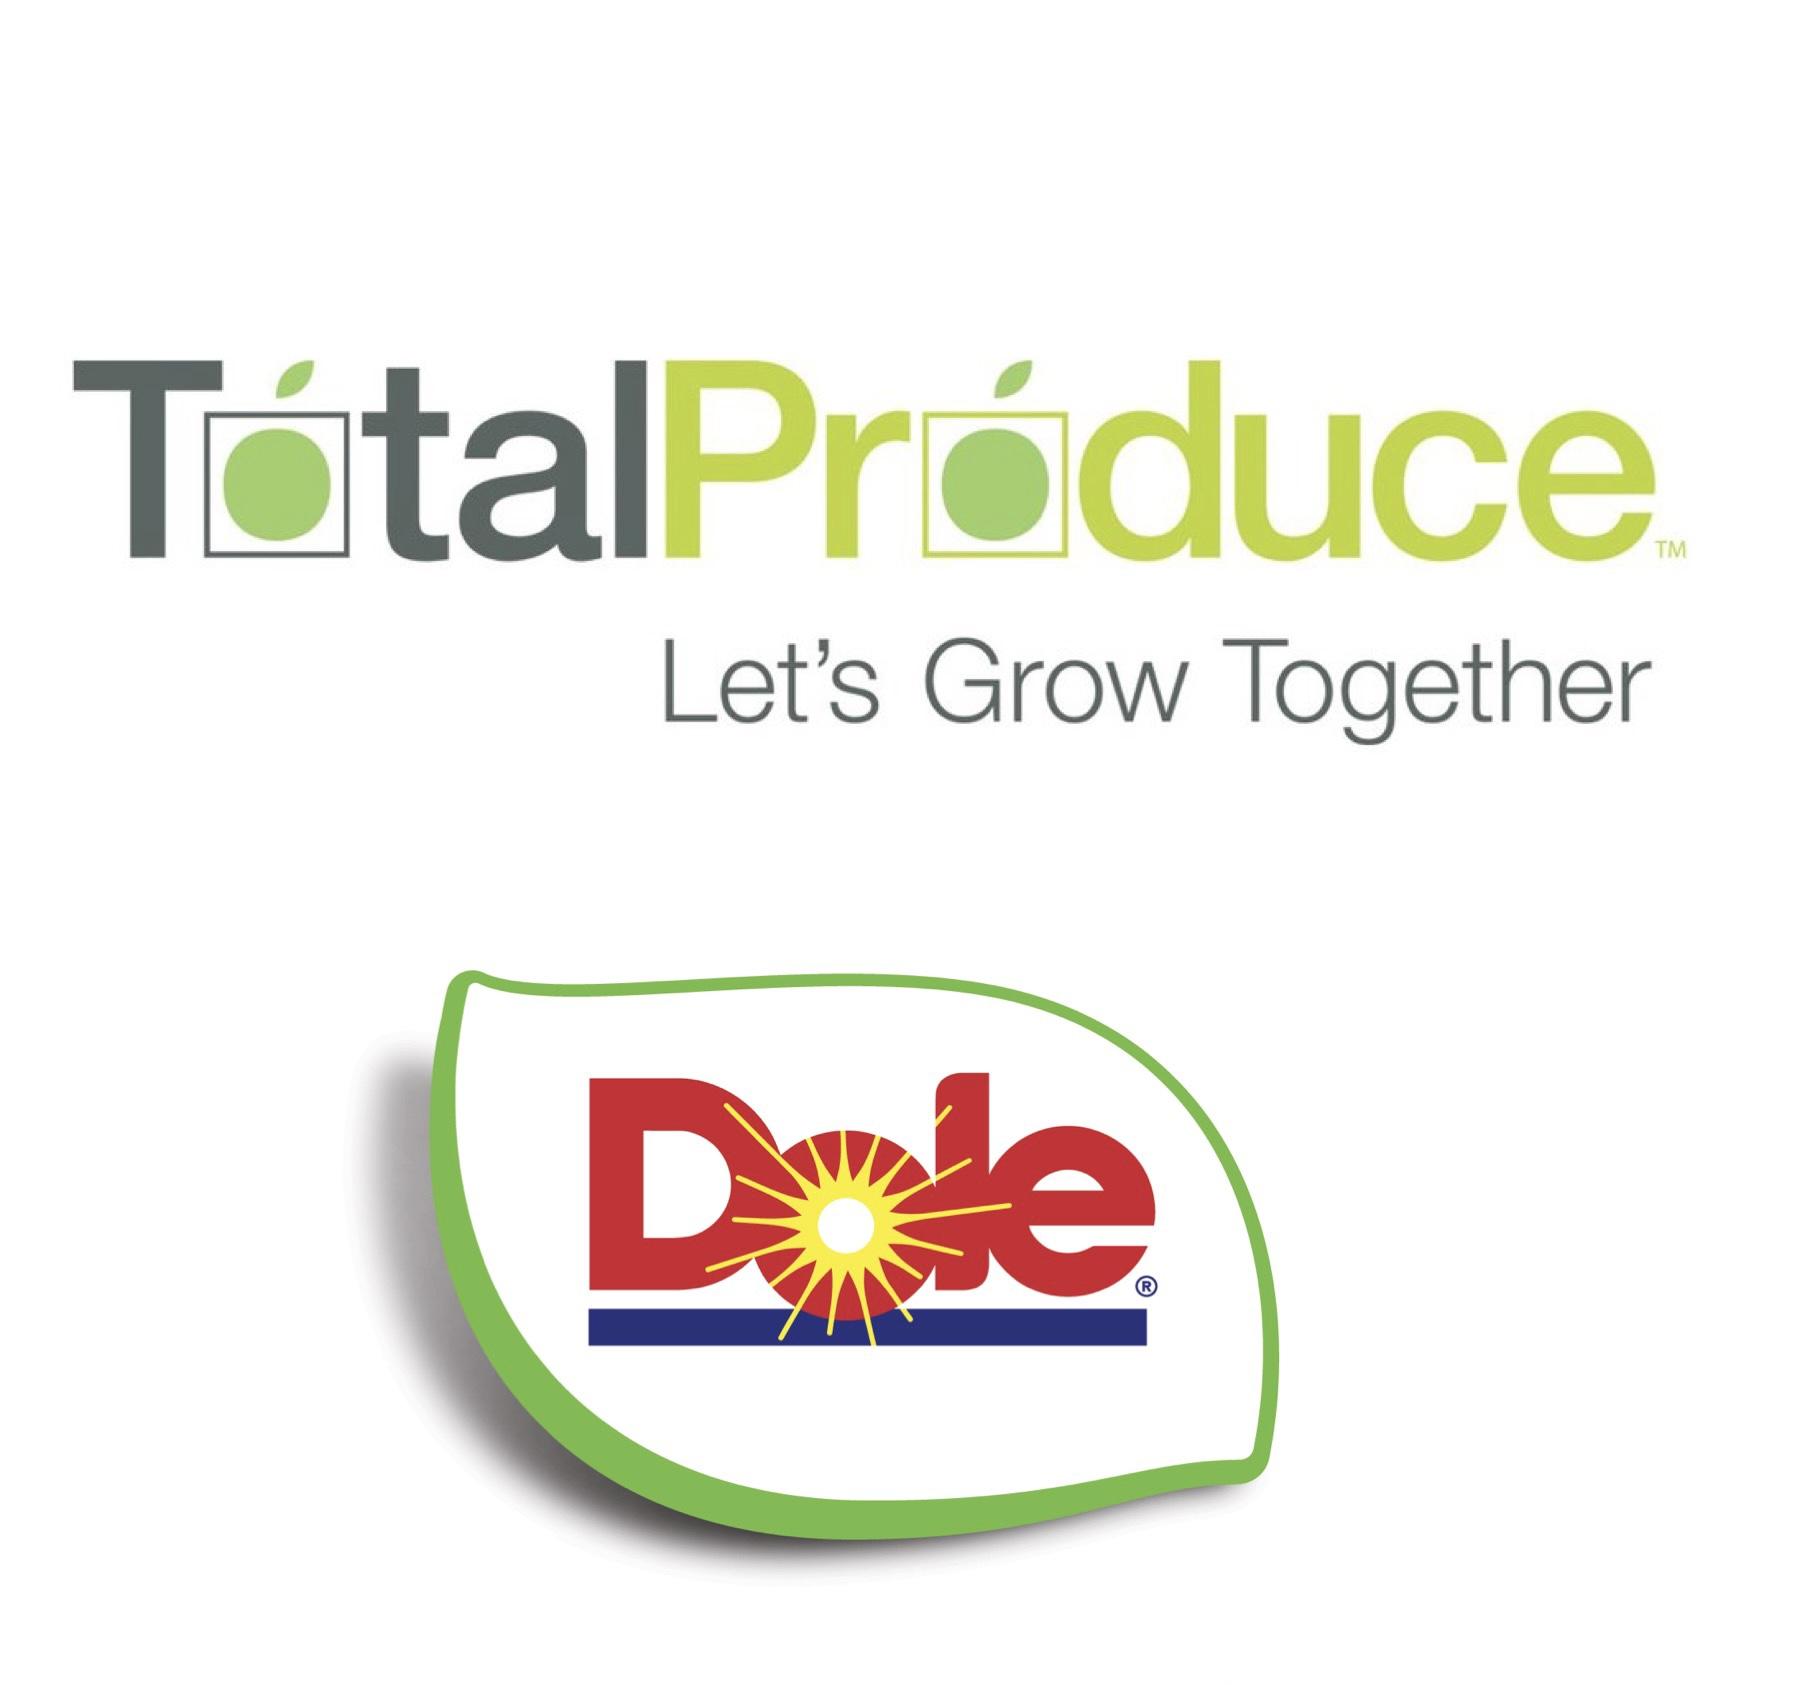 Total Produce & Dole Food